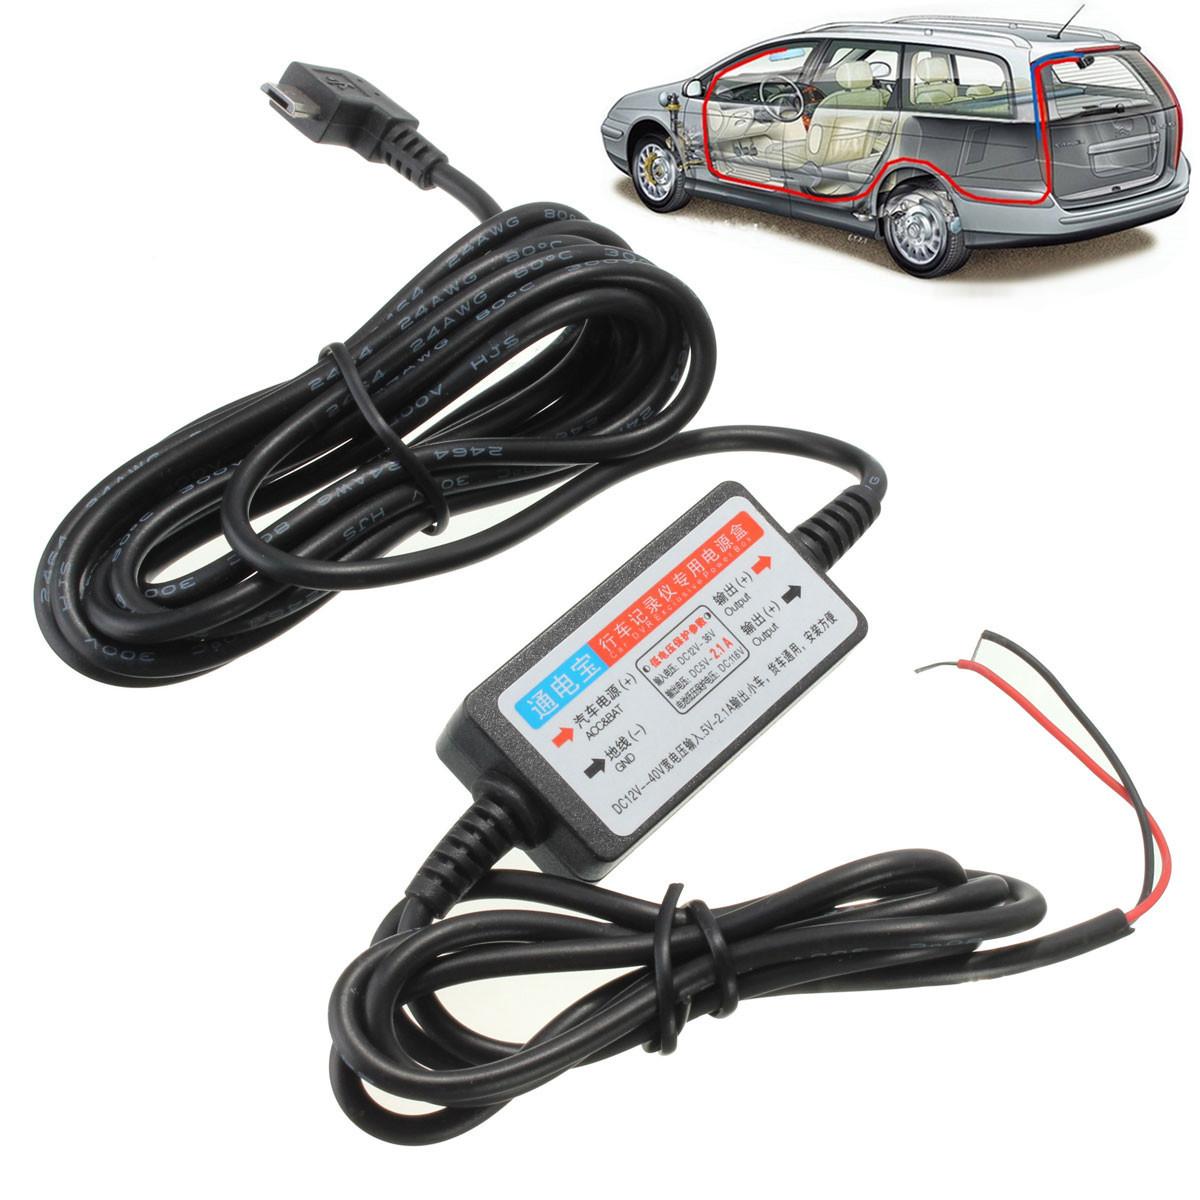 MIKRO USB Wire Kabel Car Charger Für Kamera Recorder DVR Exklusiv Power Box